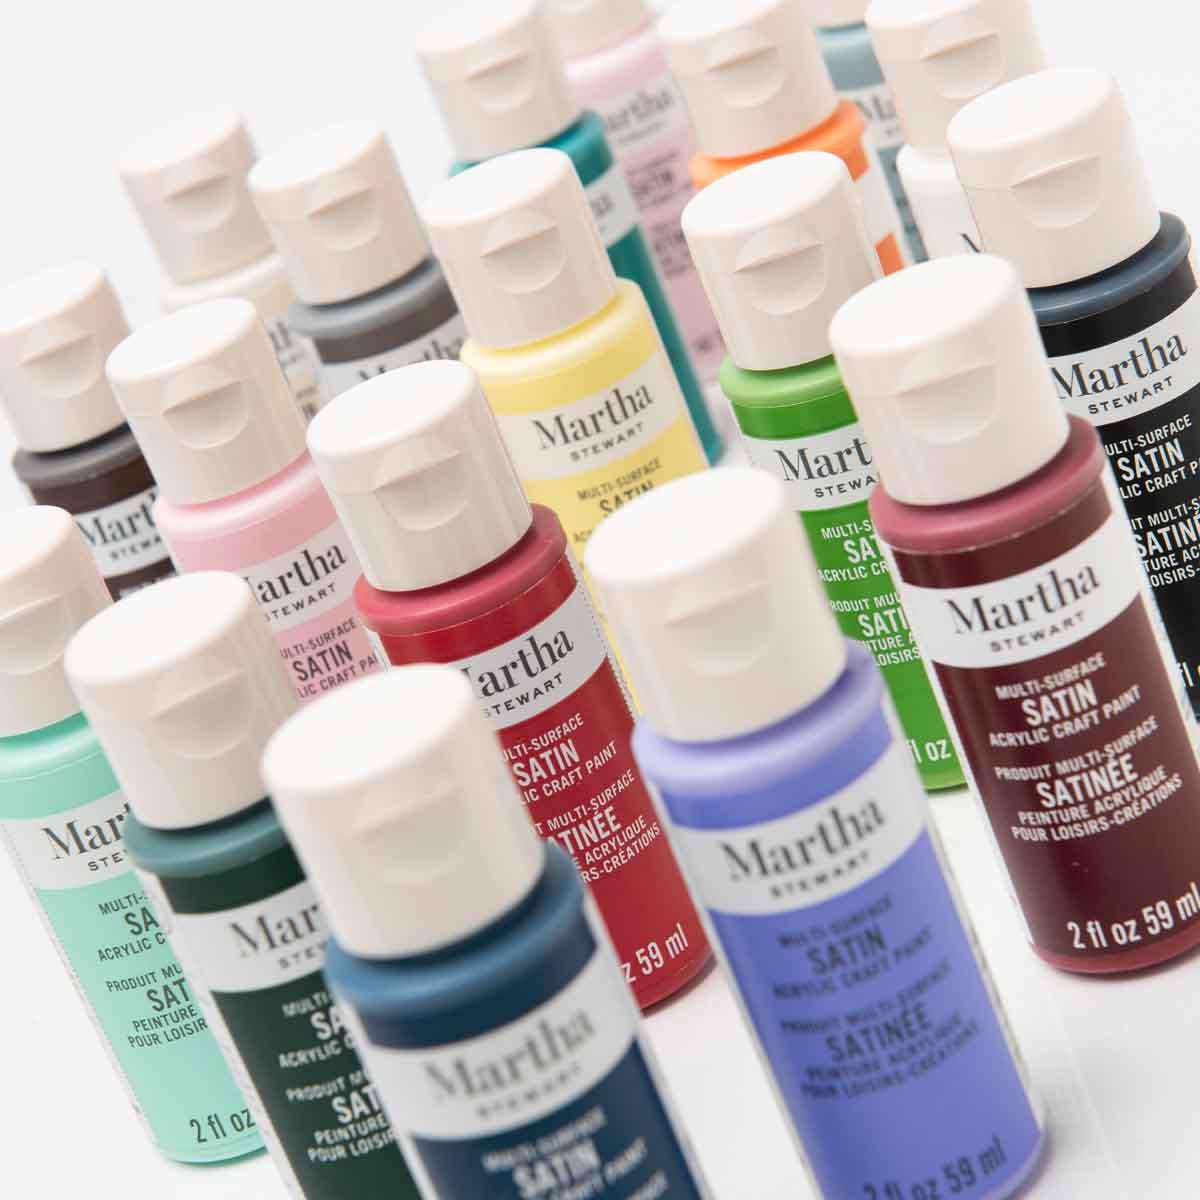 Martha Stewart ® Multi-Surface Satin Acrylic Craft Paint 18-Color Best of Paint Set - MSORIGSTN18A